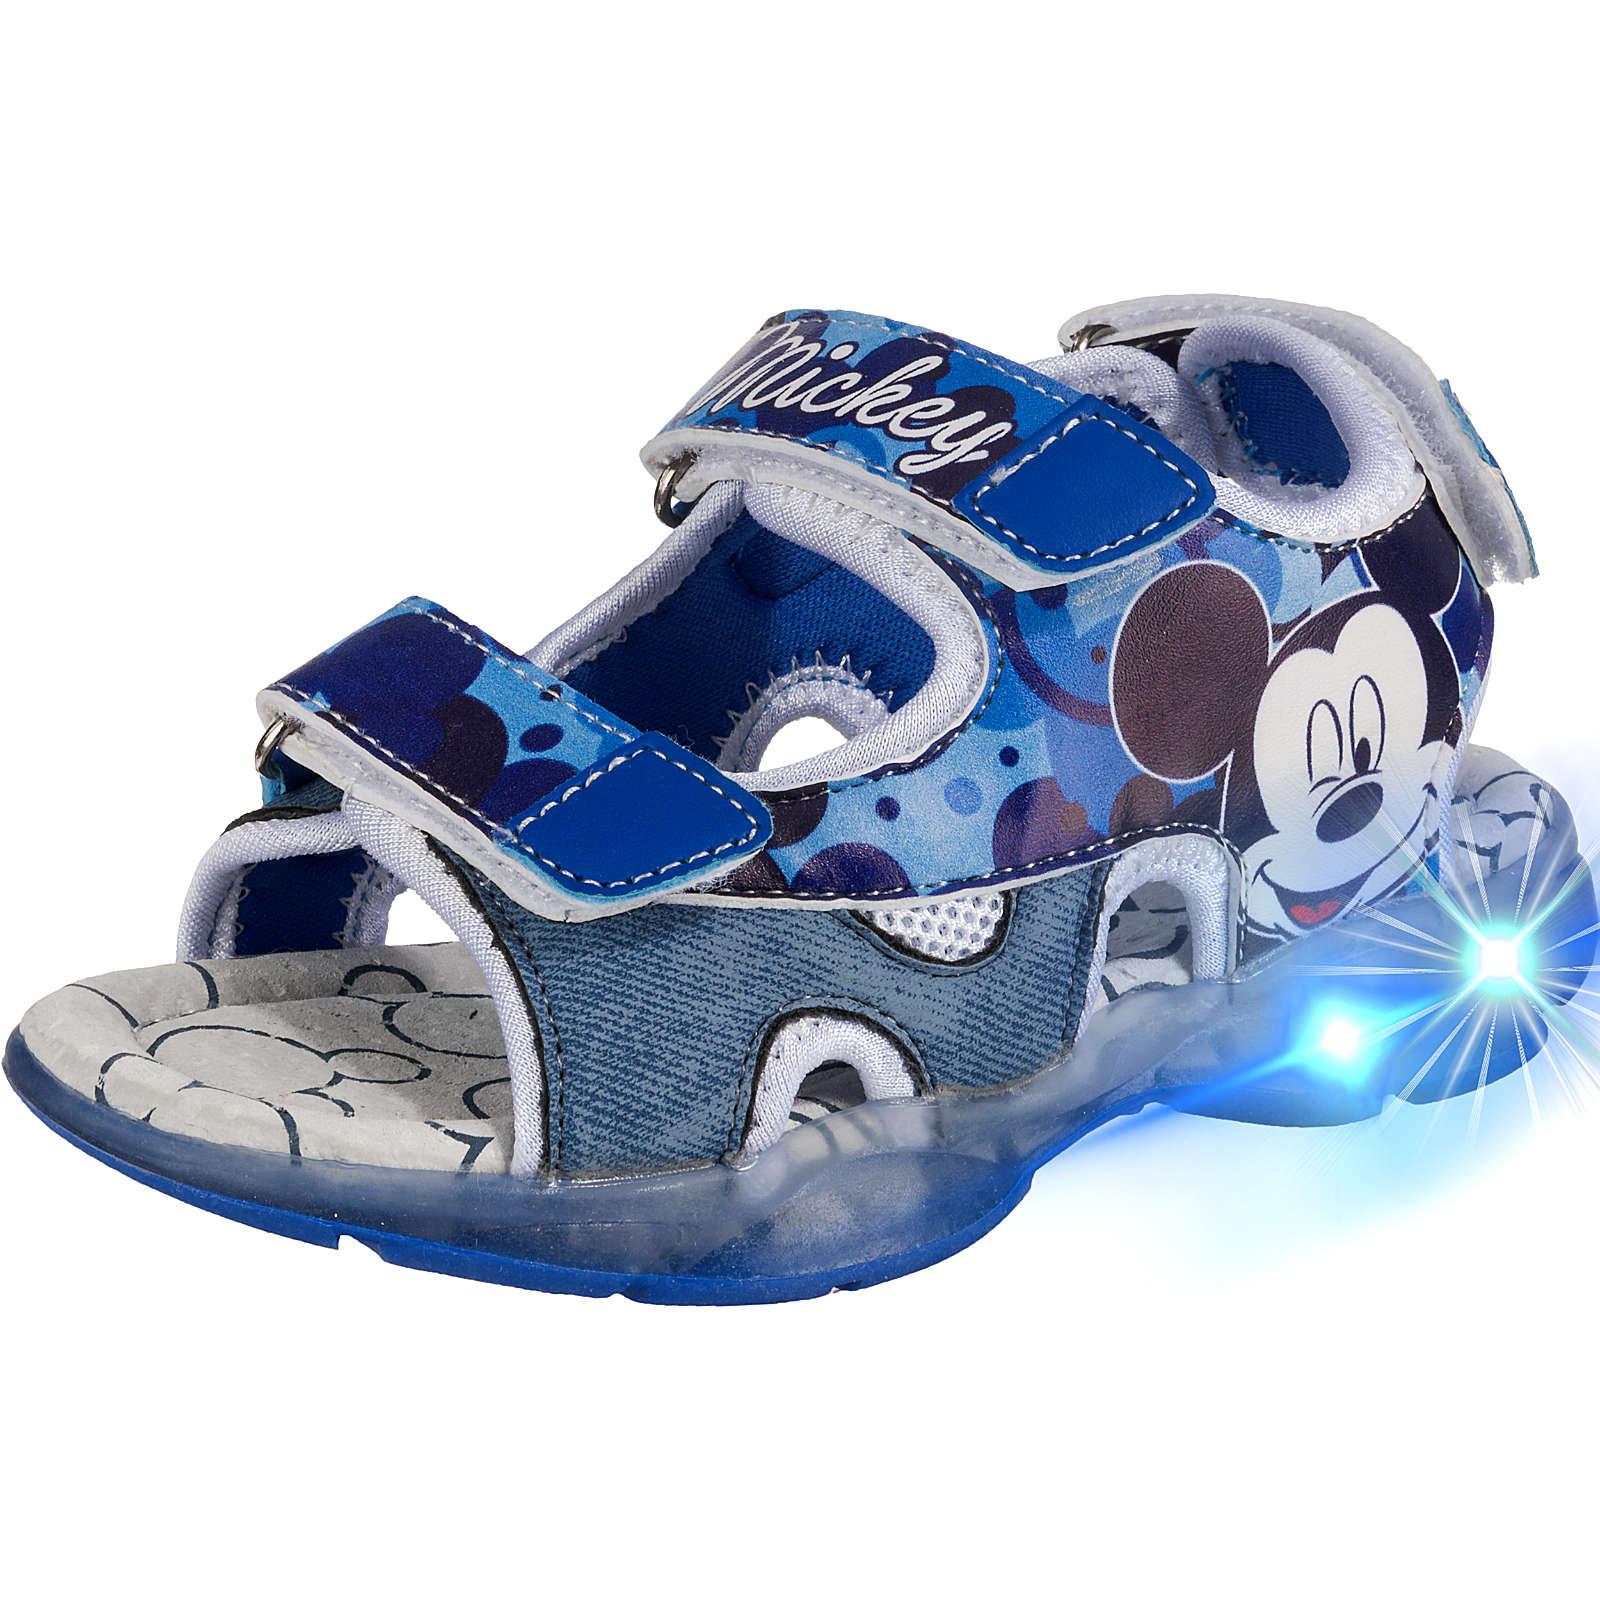 Disney Mickey Mouse & friends Baby Sandalen Blinkies für Jungen dunkelblau Junge Gr. 25